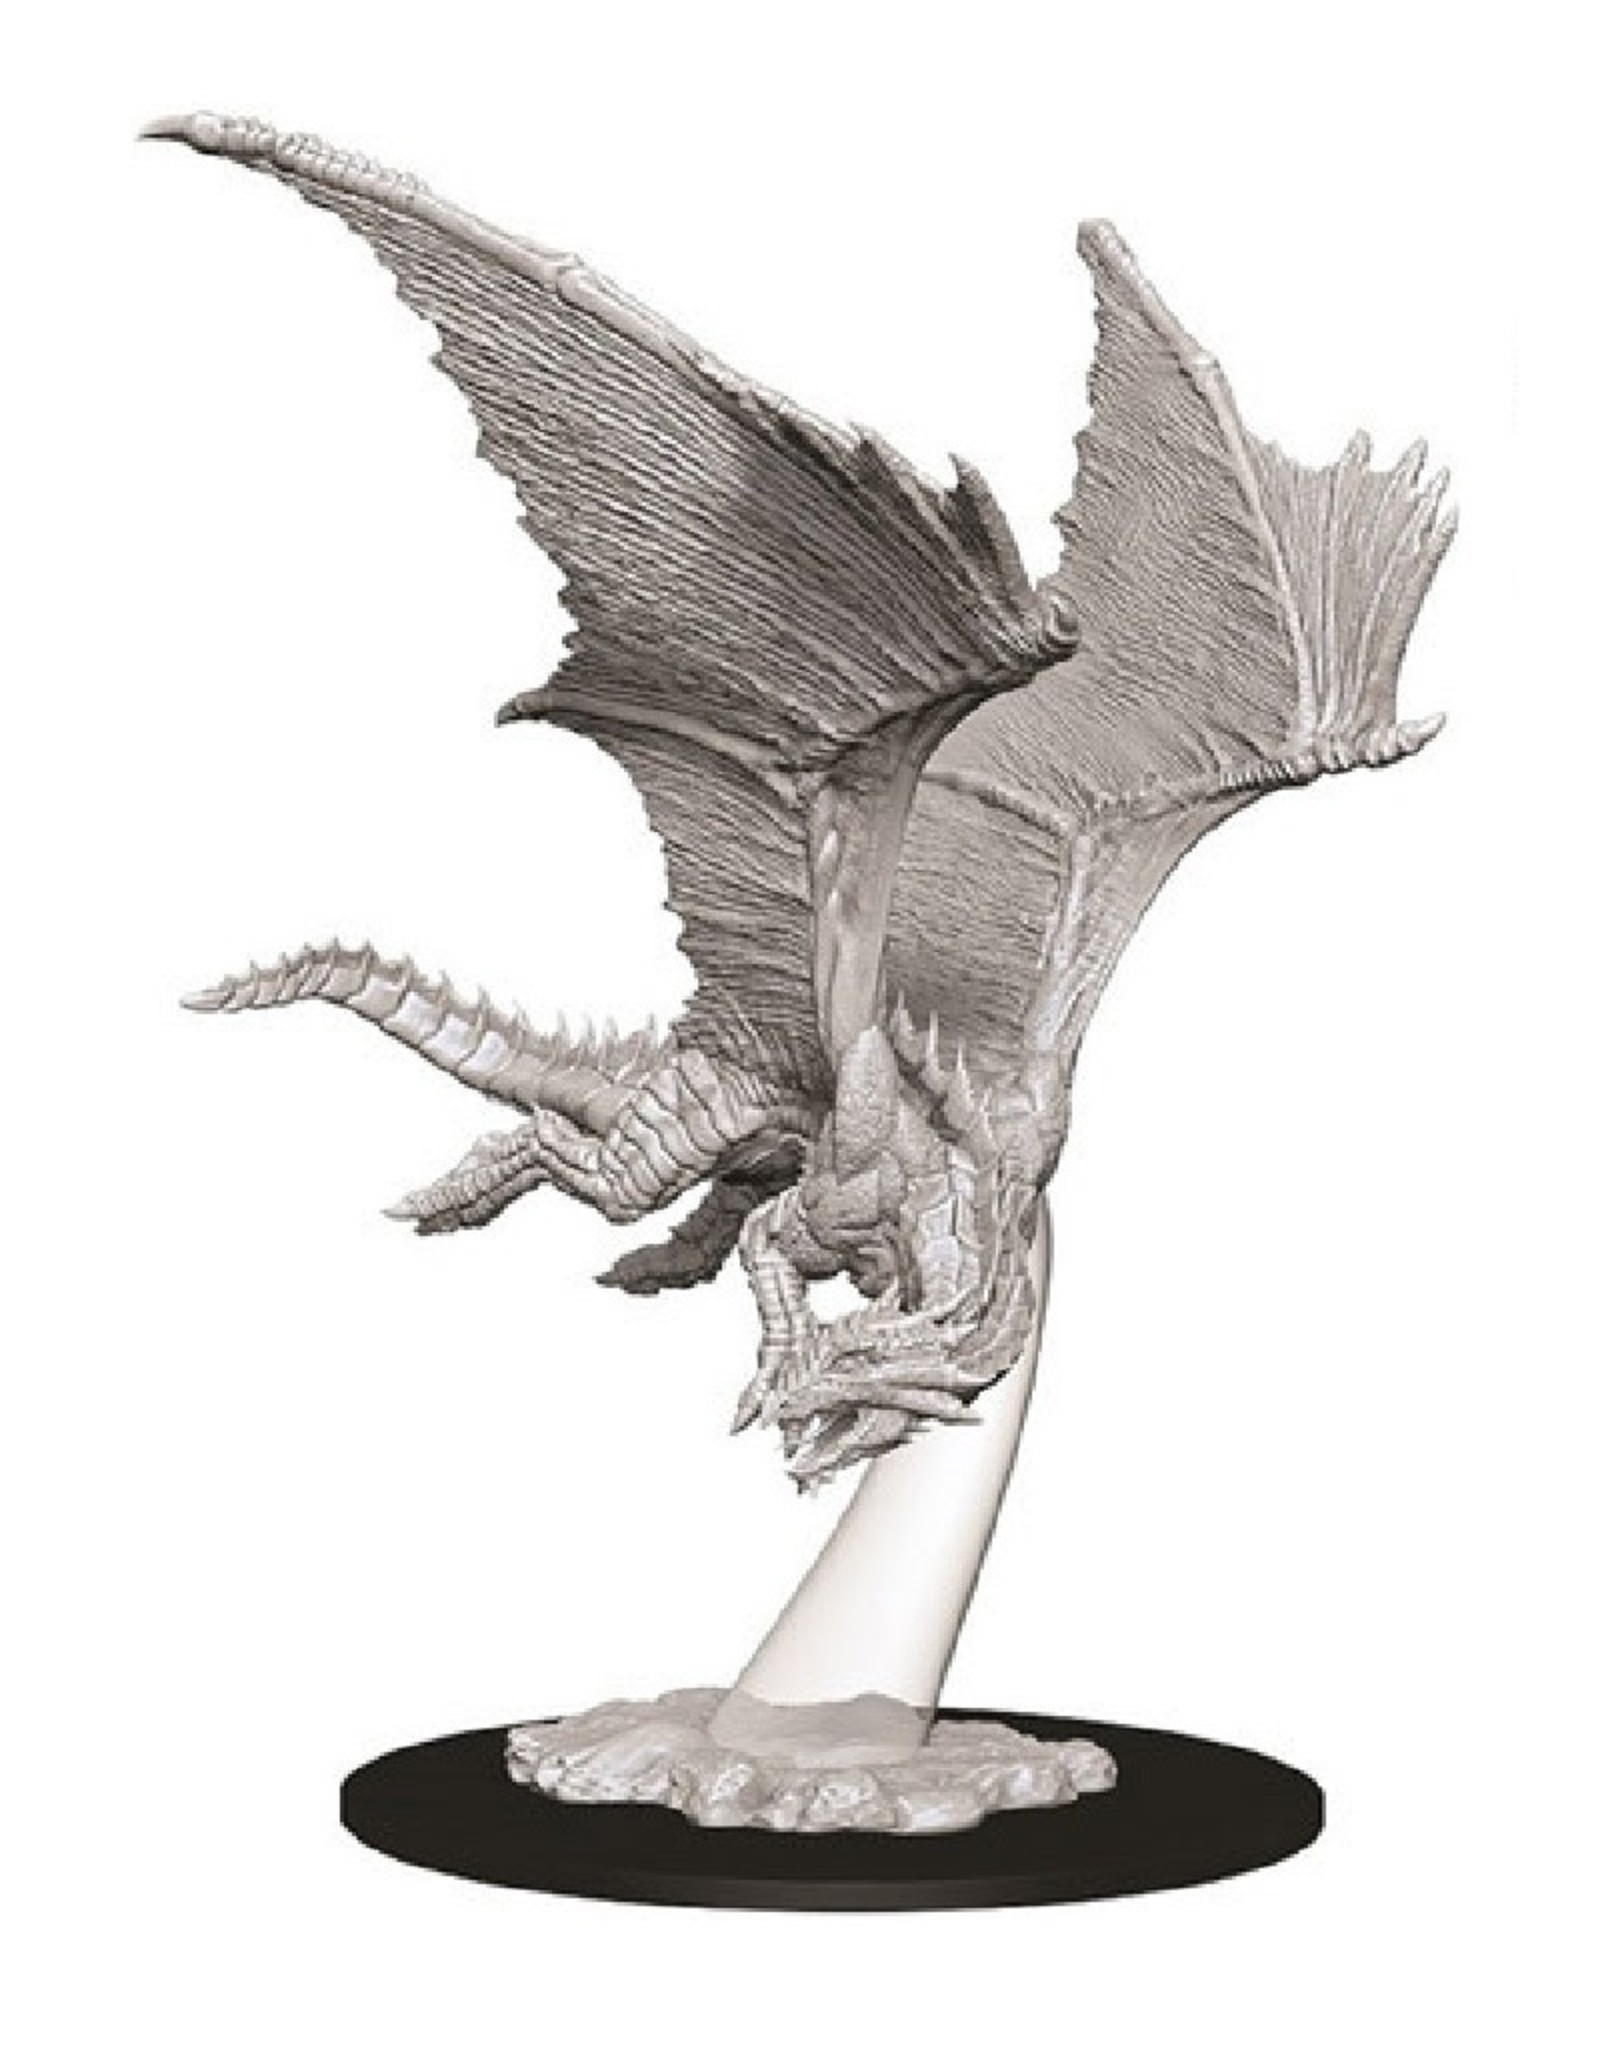 Dungeons & Dragons - Nolzur's Young Bronze Dragon (D&D) (WZK73710)